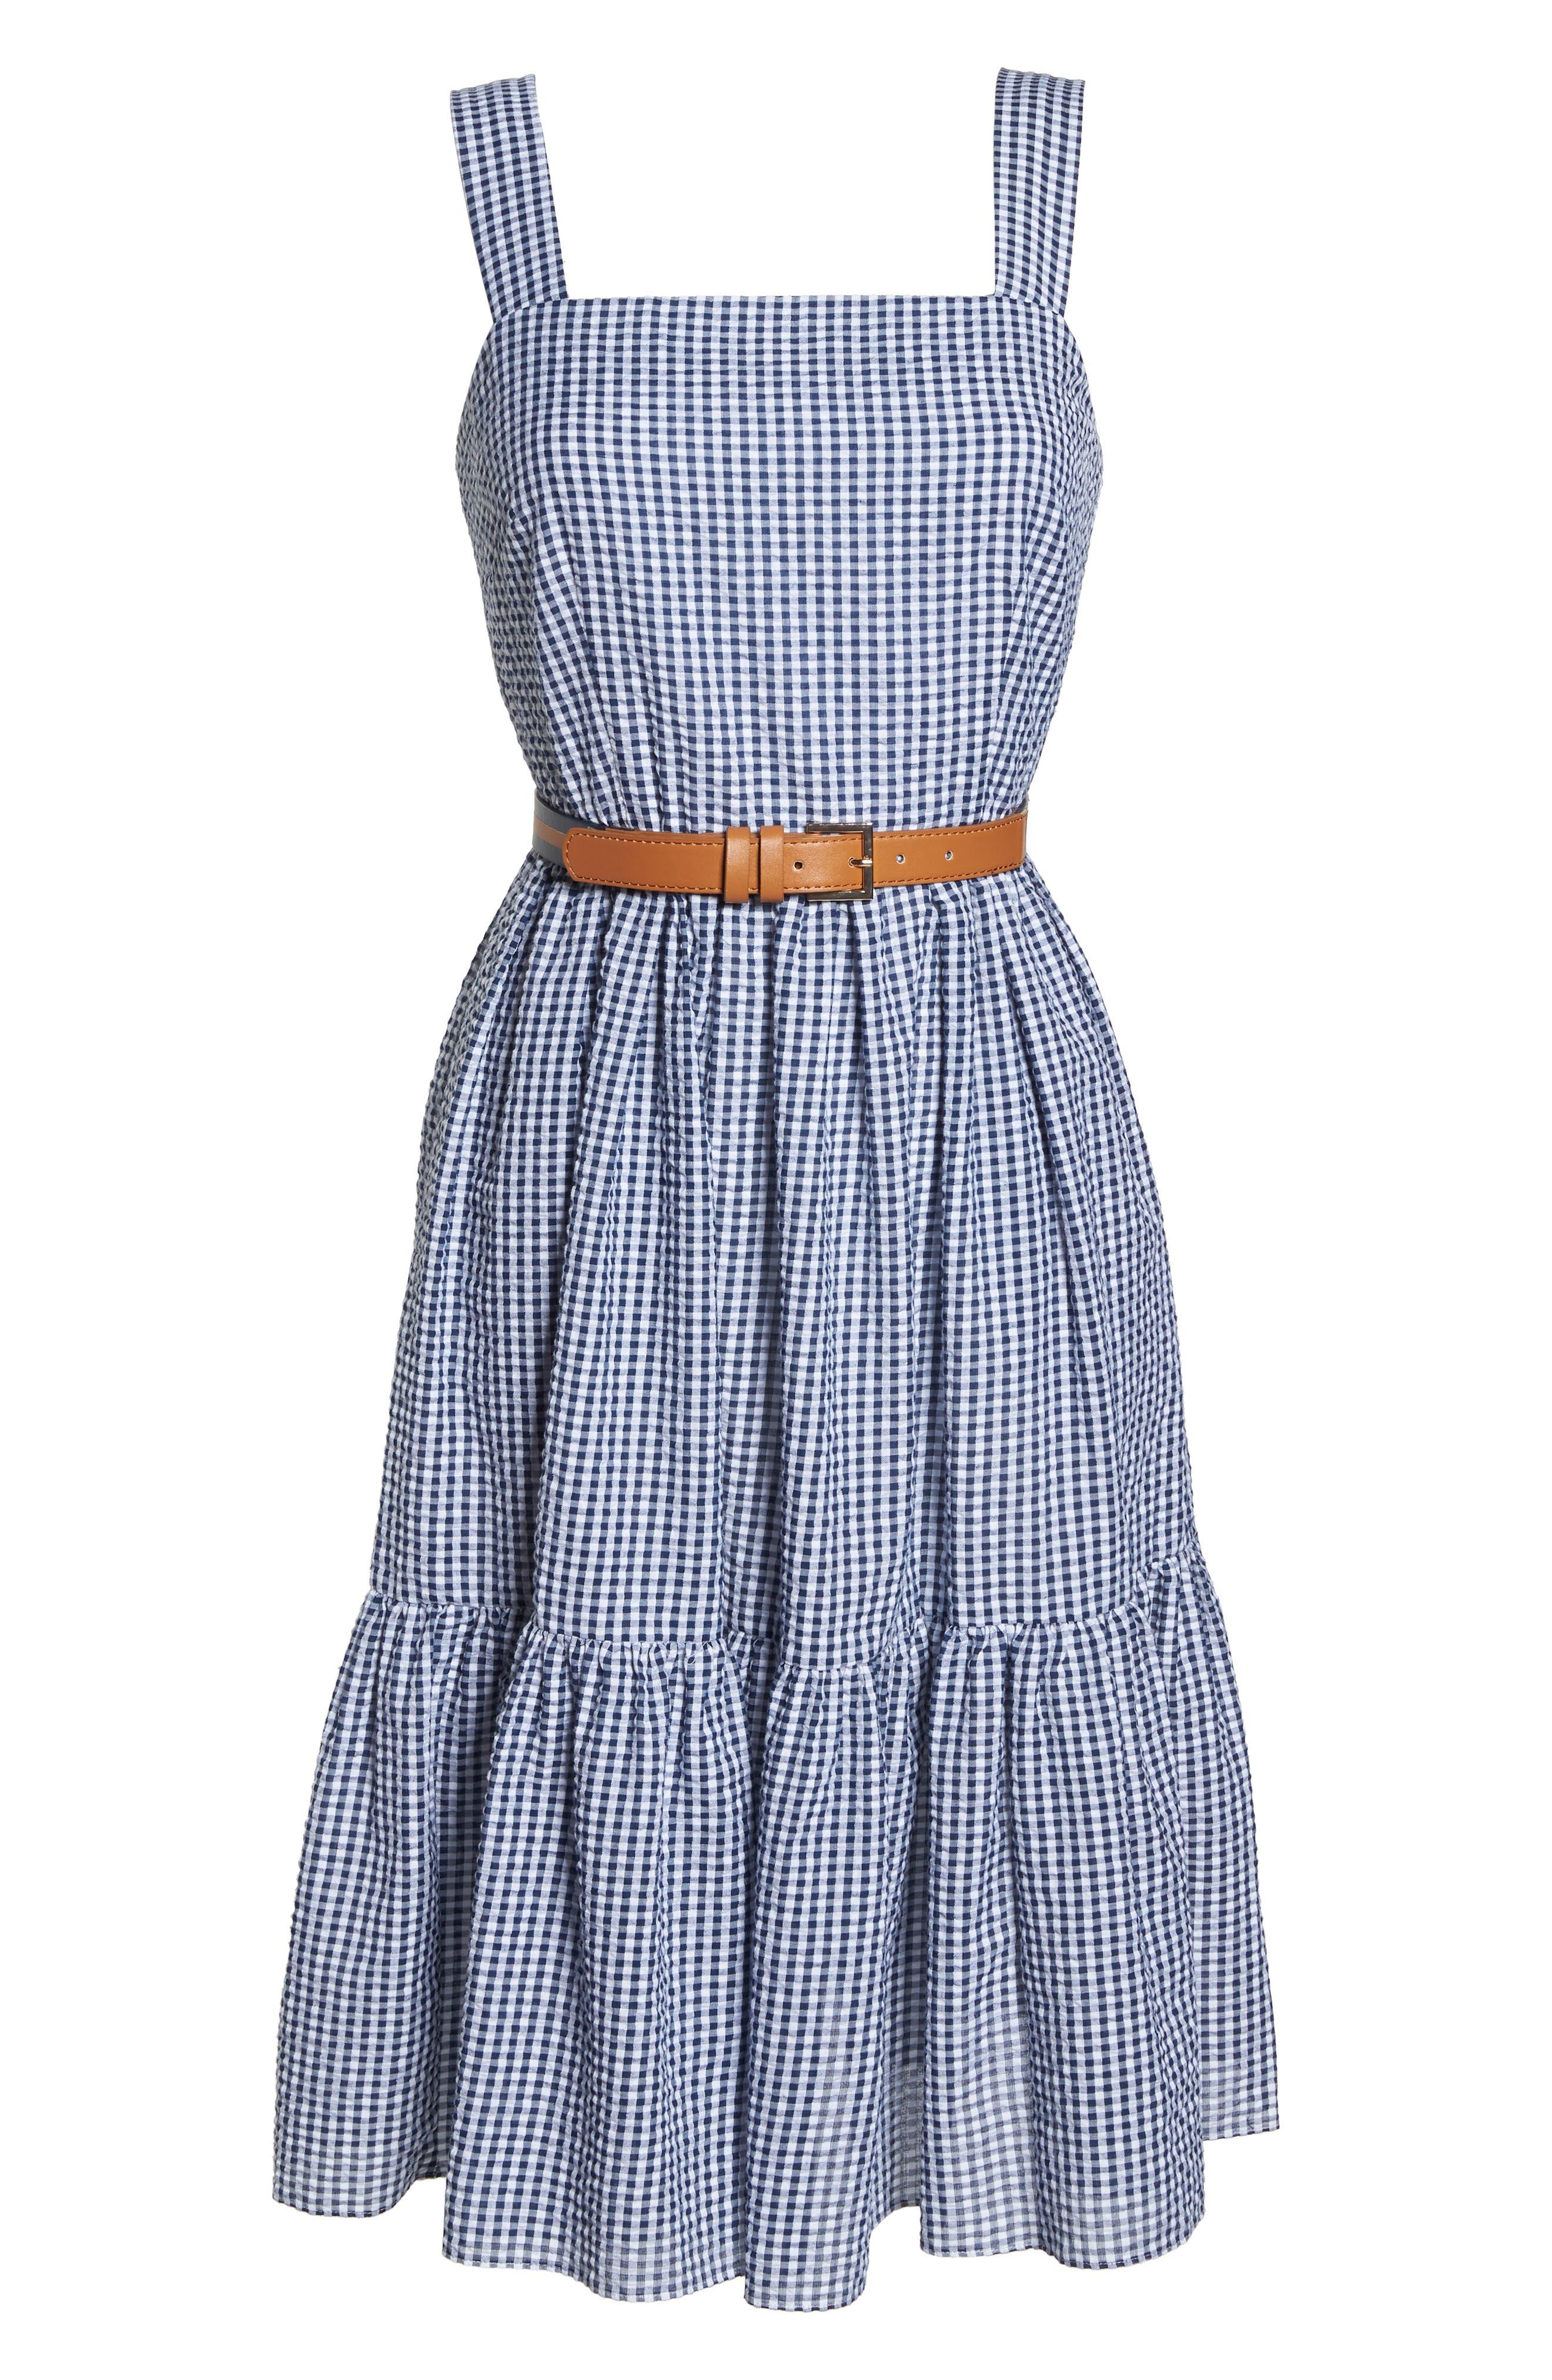 Ruffle Hem Seersucker Check Fit & Flare Dress,                             Alternate thumbnail 7, color,                             Navy/ Ivory